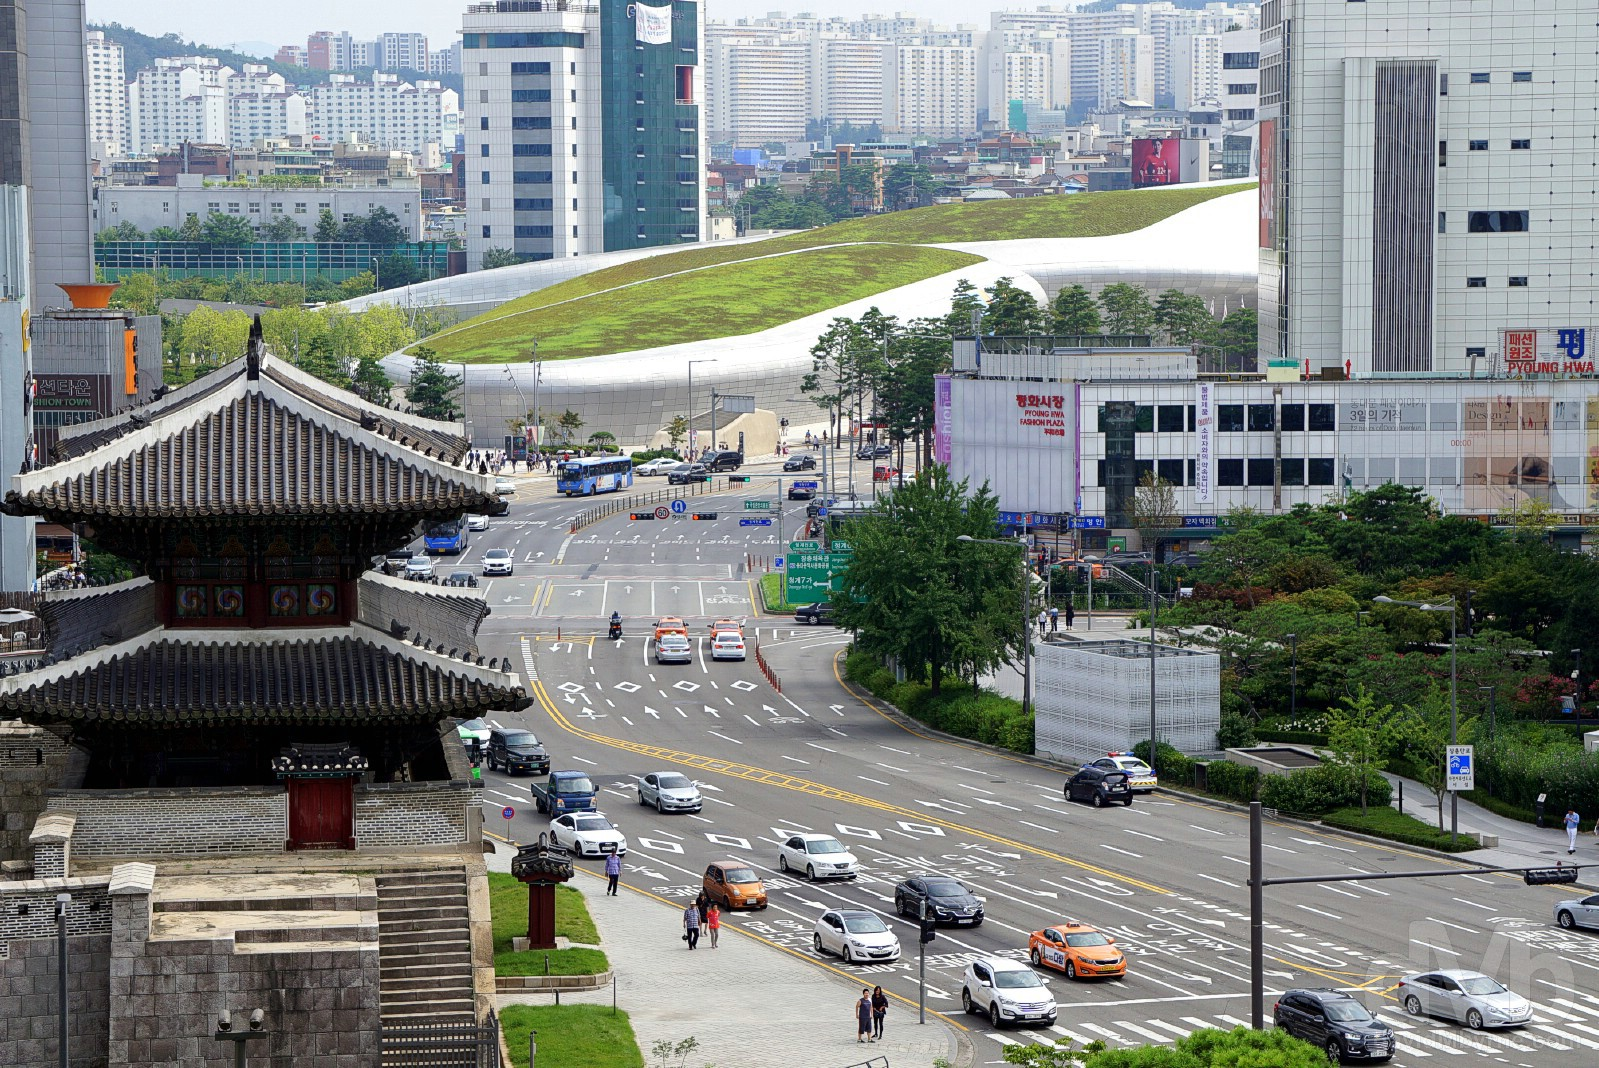 Dongdaemun, Seoul, South Korea. July 30, 2017.